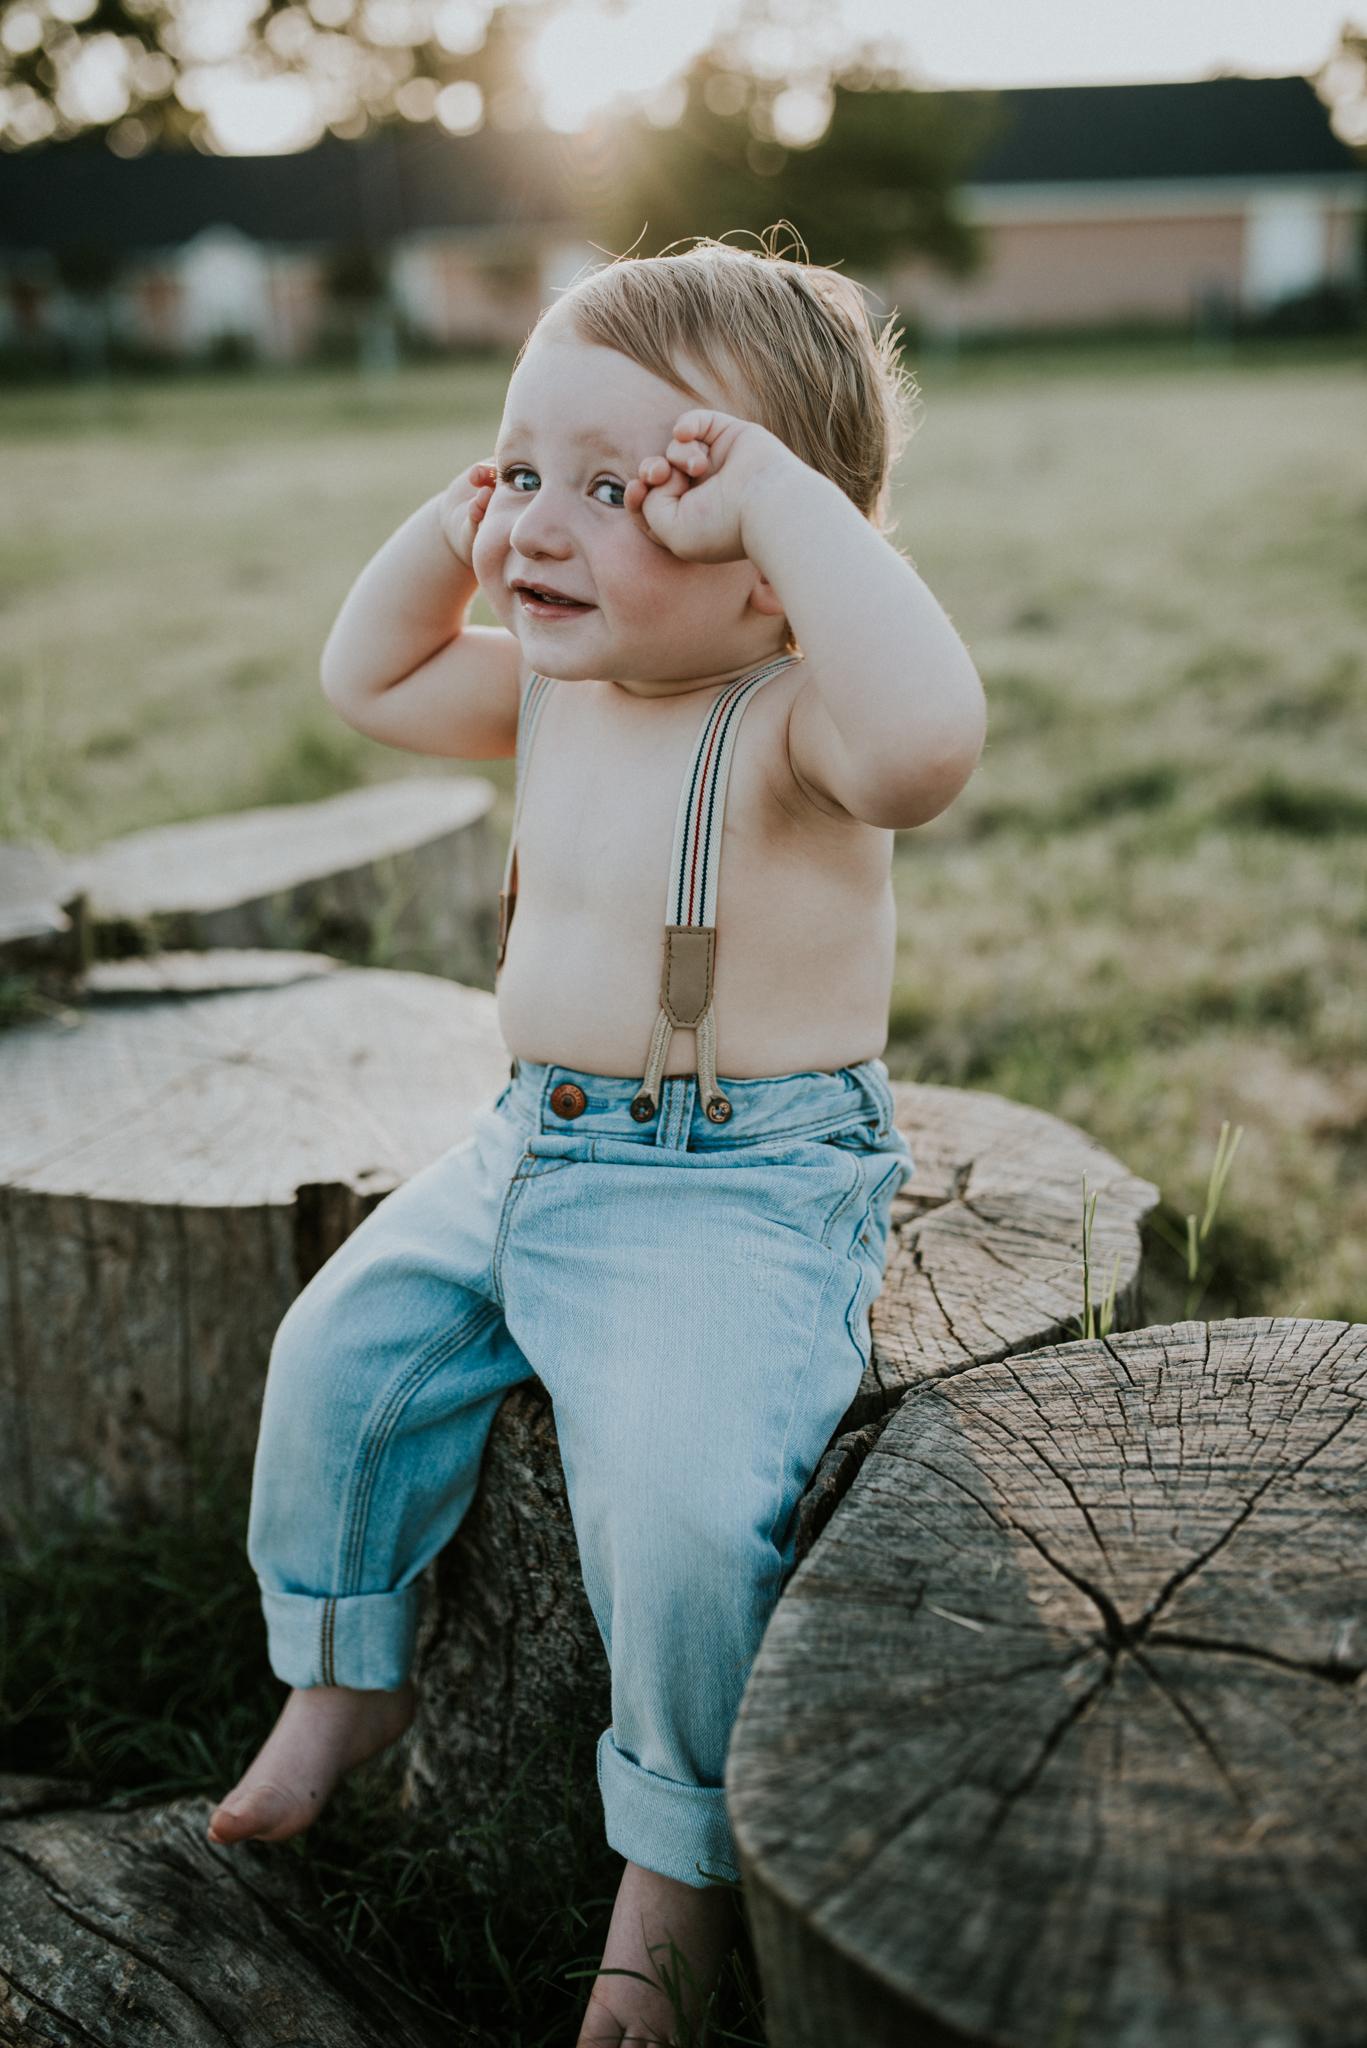 Graham-18 months-43.jpg